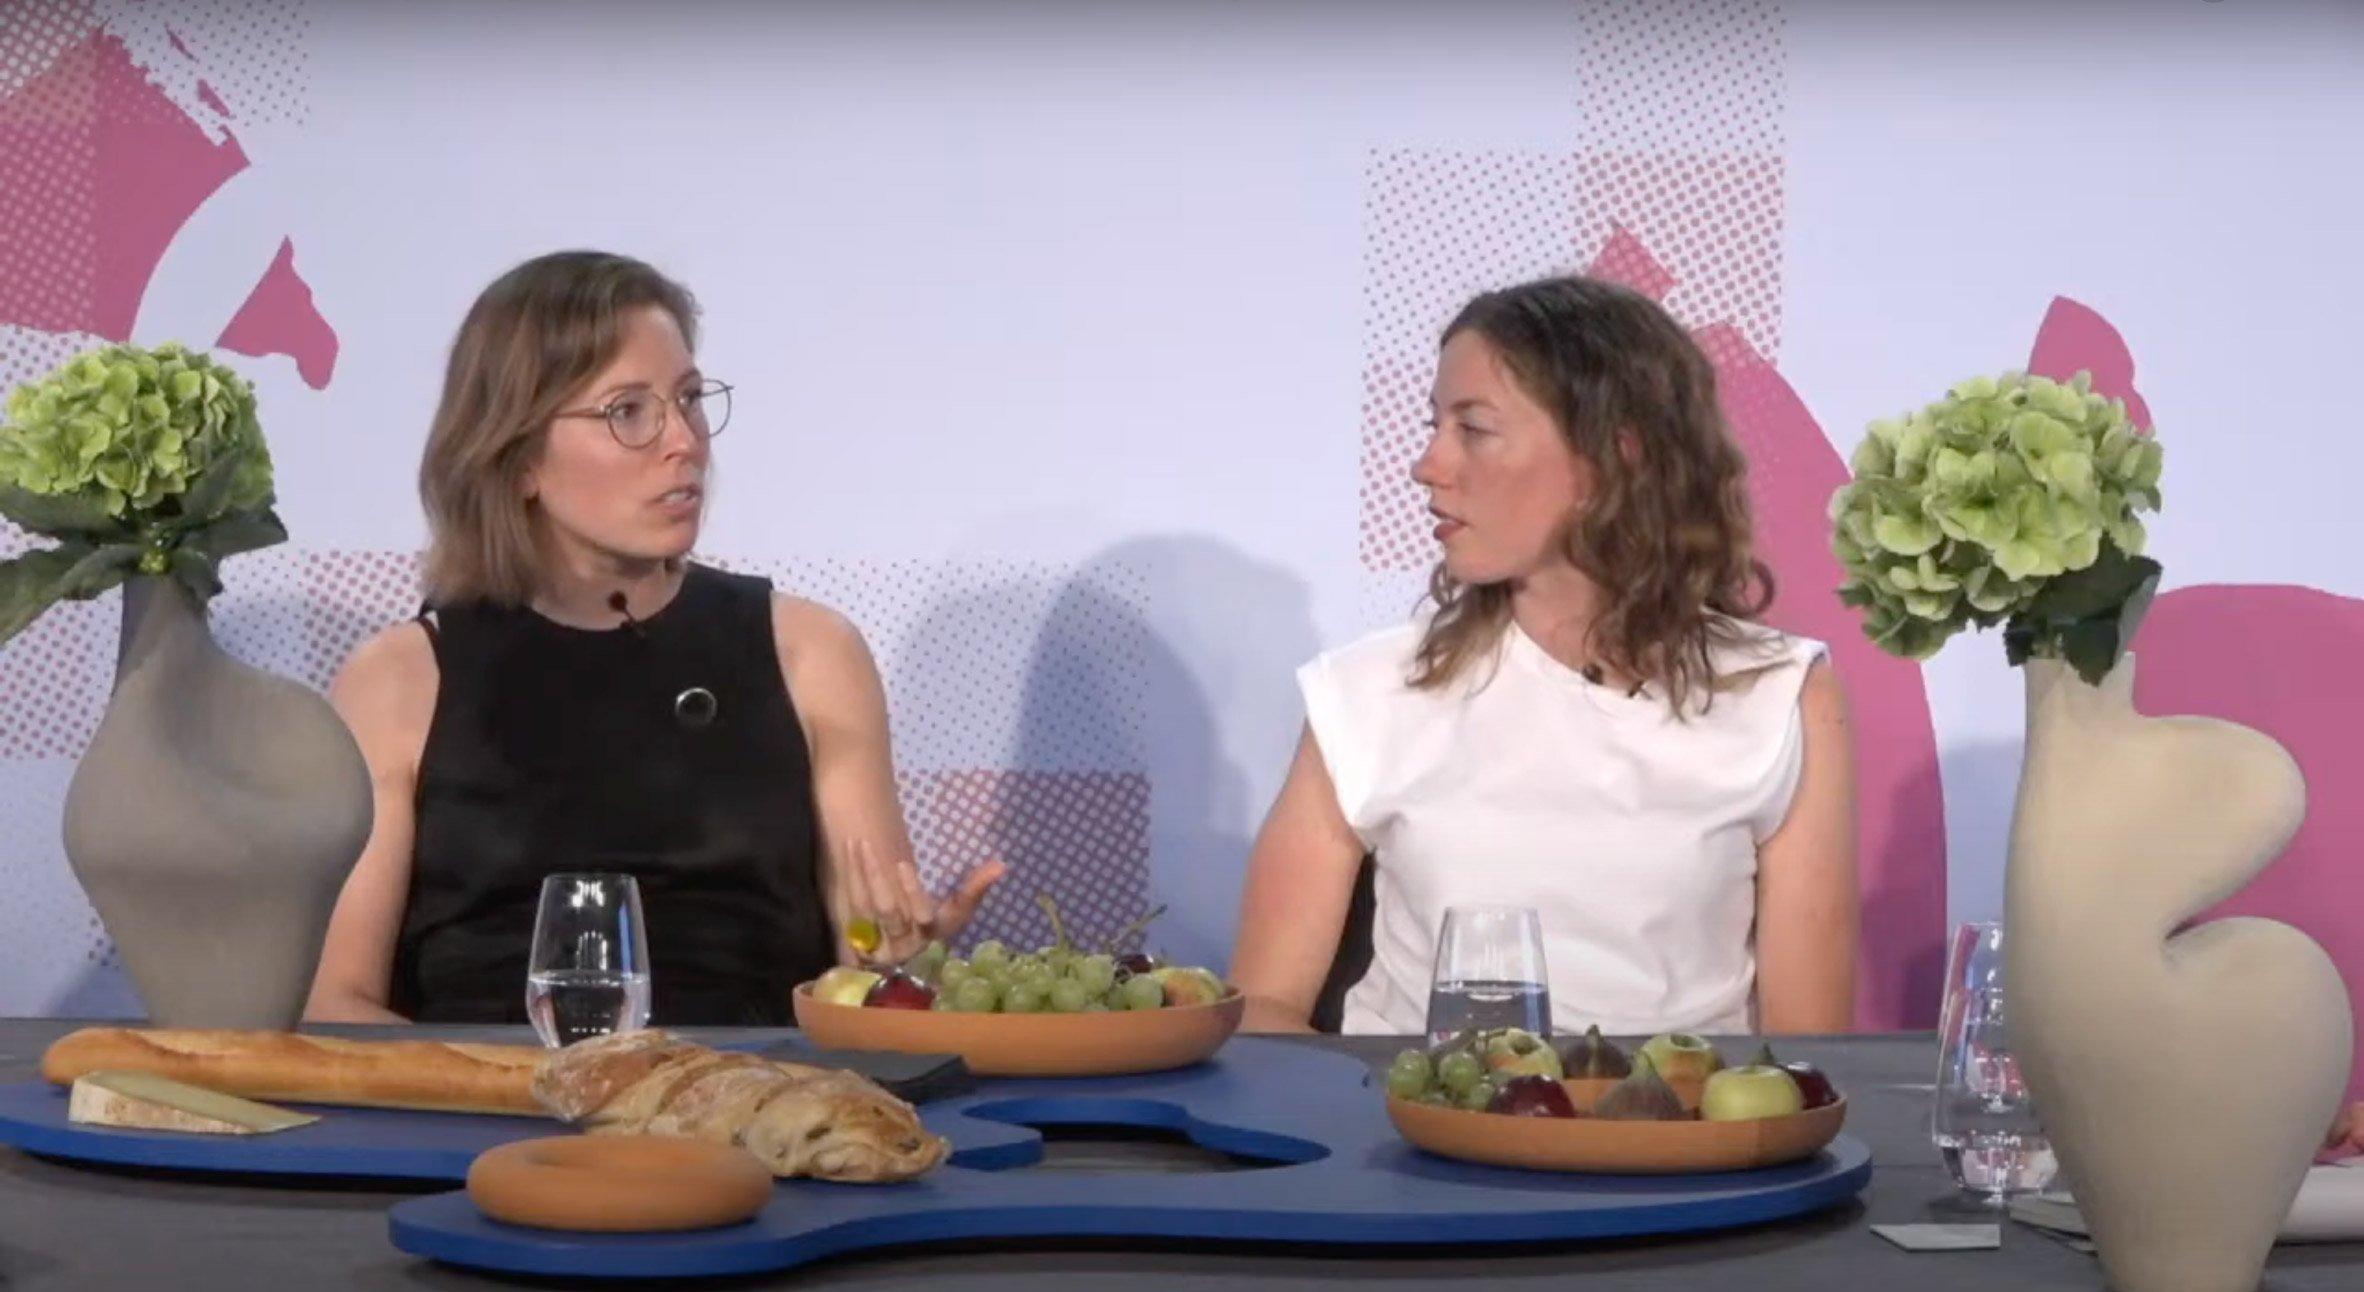 Marjan van Aubel and Pauline van Dongen at Design Miami/Basel talk